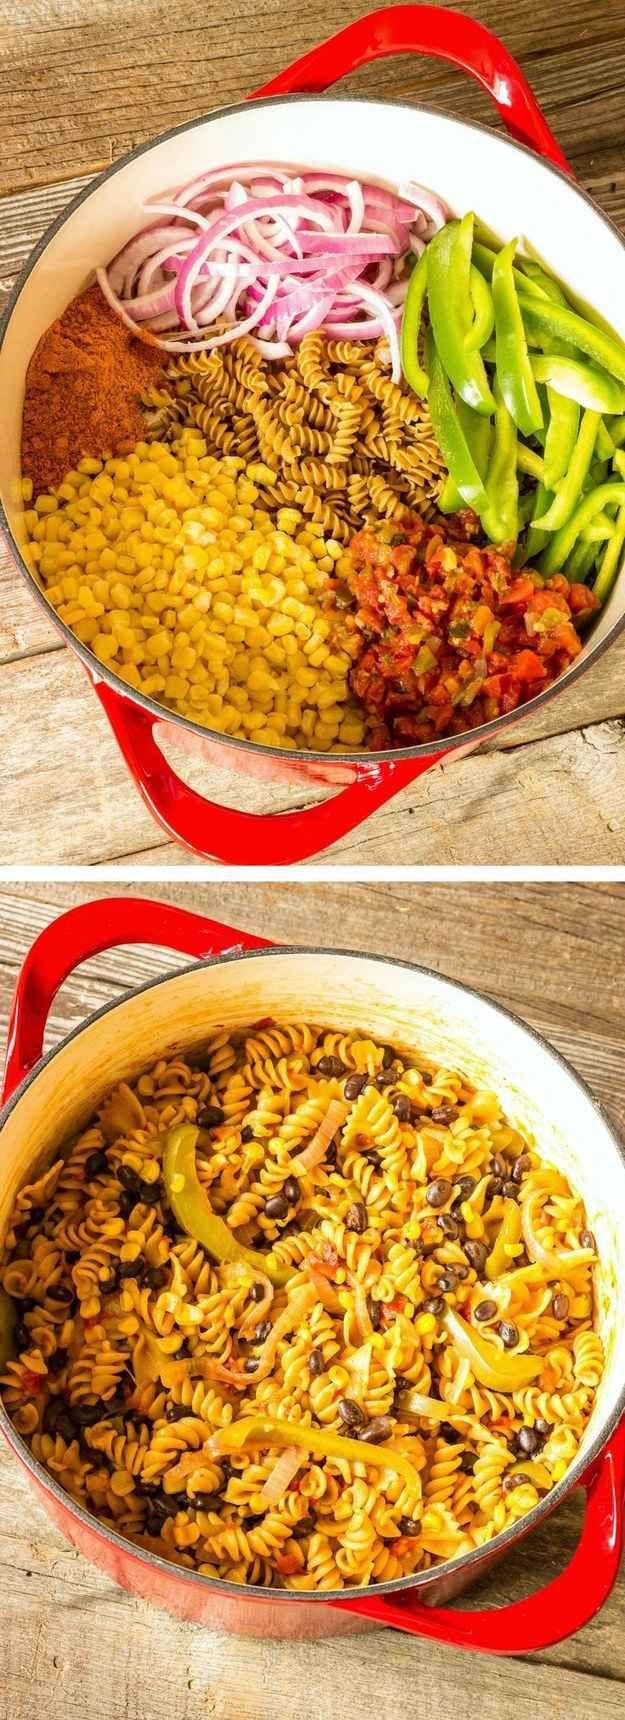 Veggie-packed Southwest Pasta